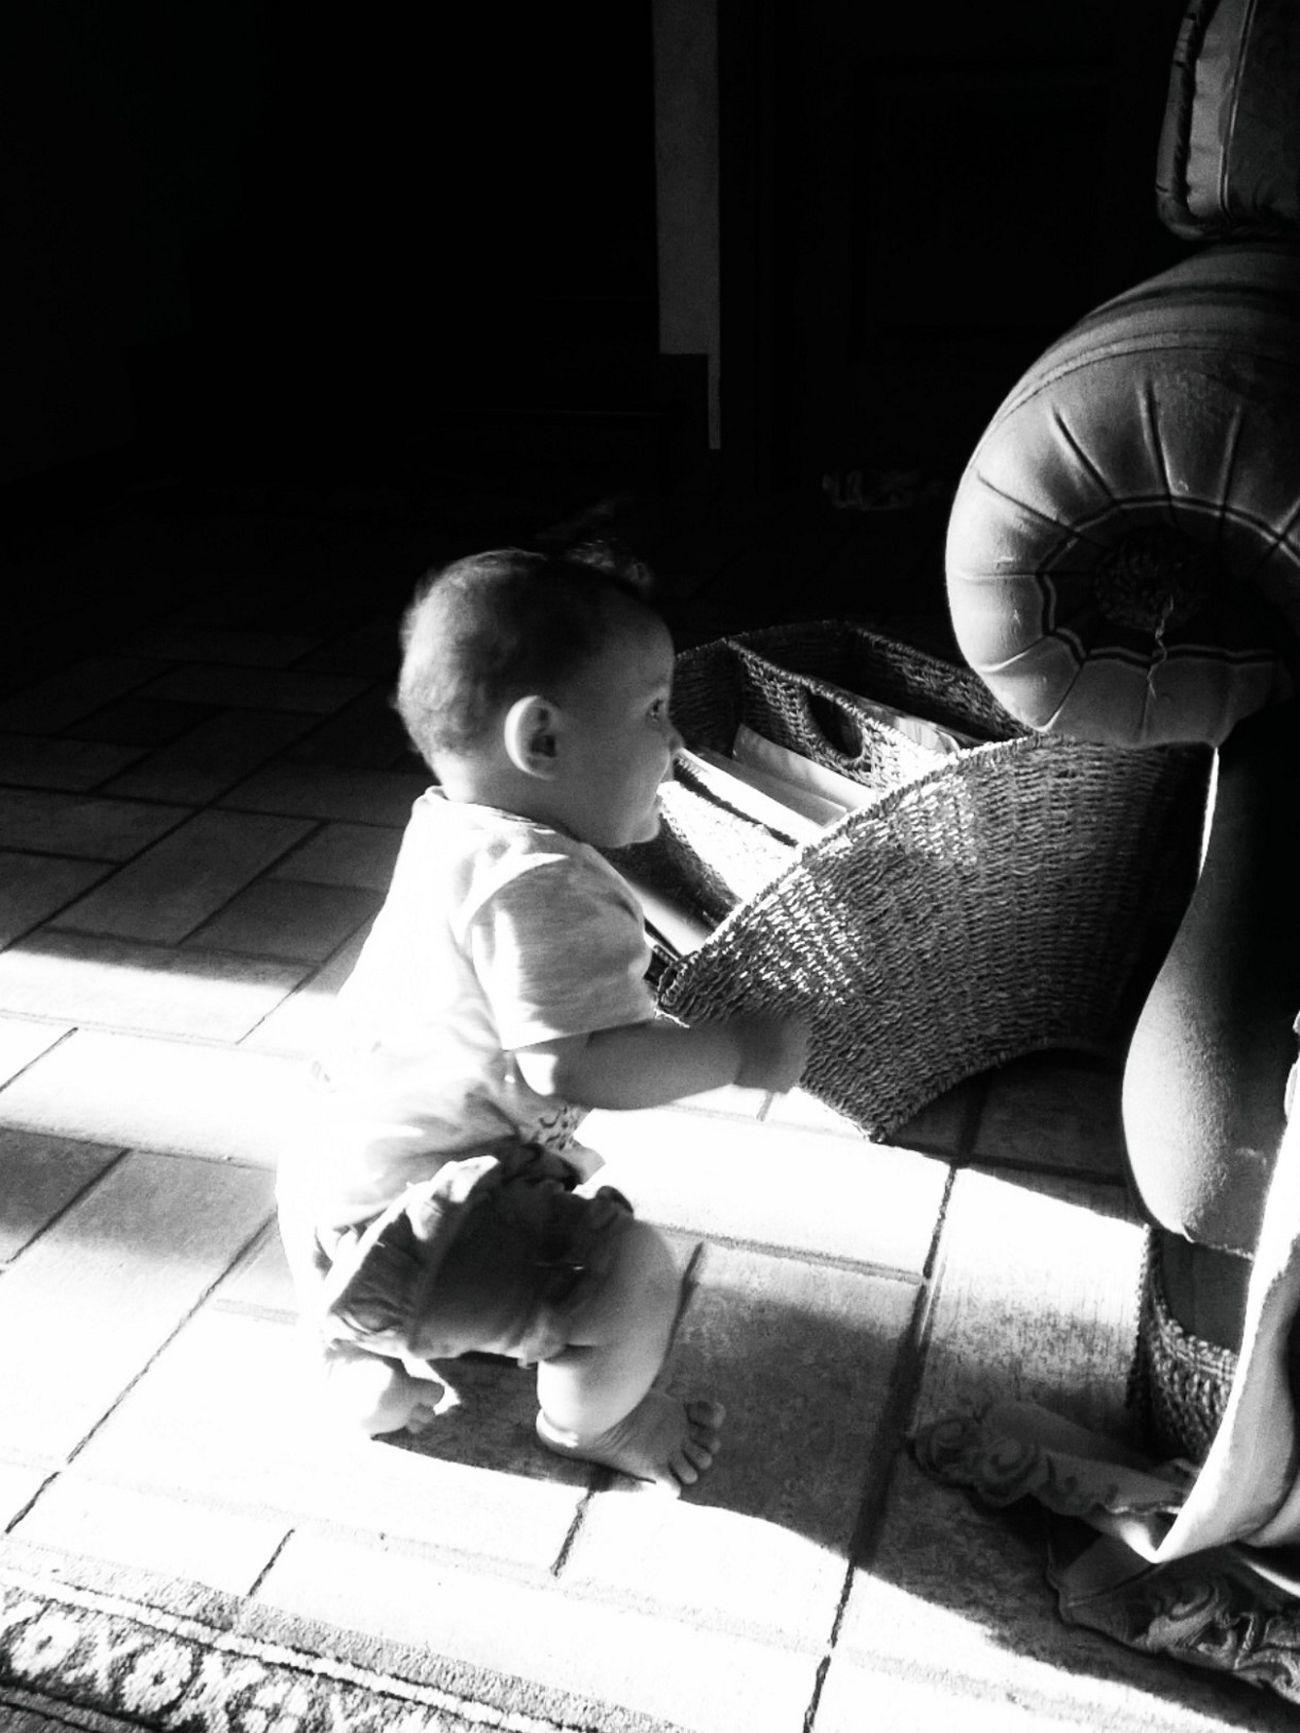 AuntieLove Blackandwhite Photography Boy Cute Fun Ian Lovehim Mybabyboy❤️❤️❤️❤️ Mybaby❤ Nephew ♡ Start To Walk